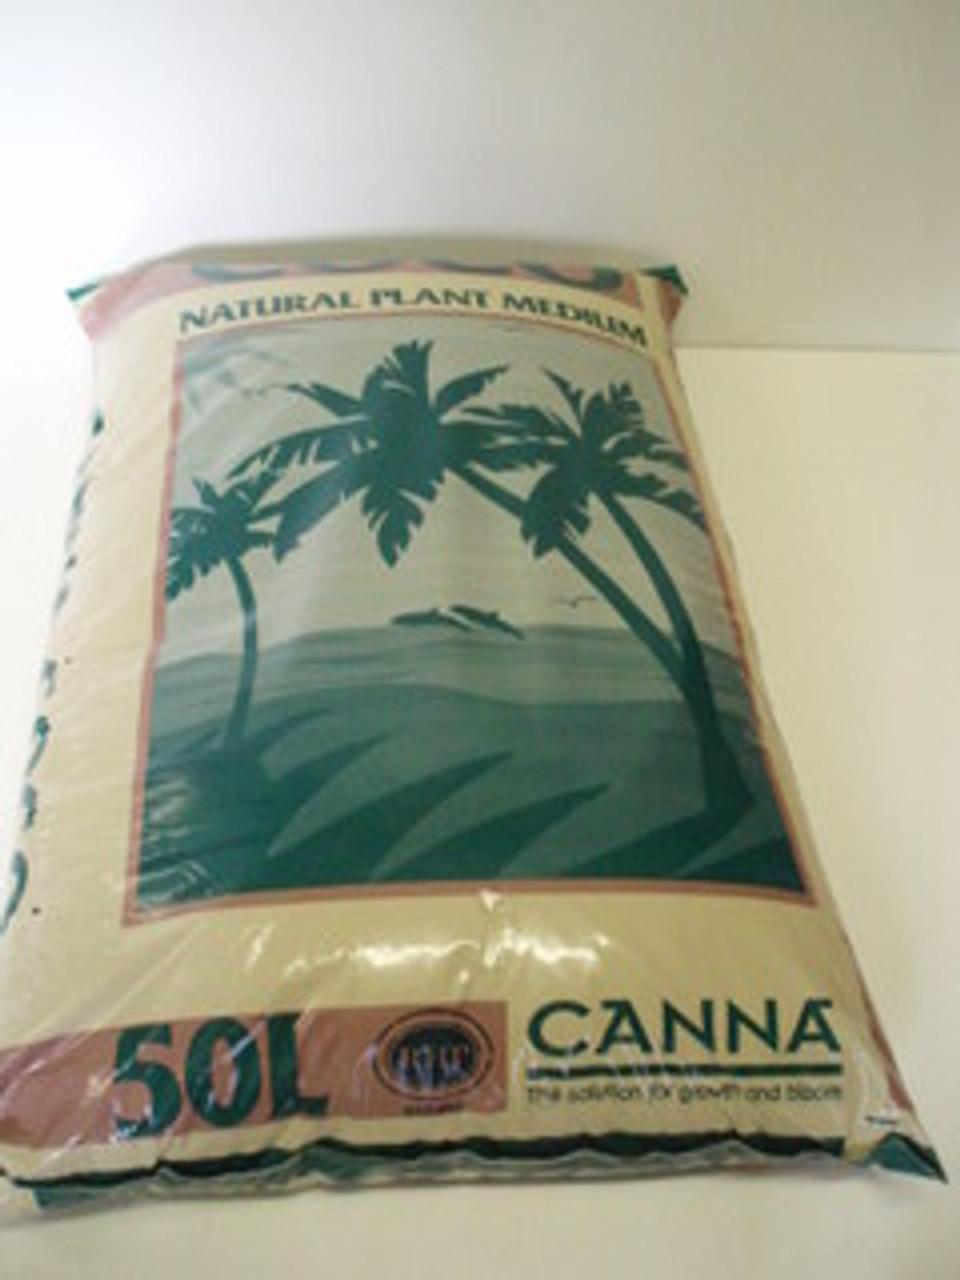 Canna Coco 50L Bag